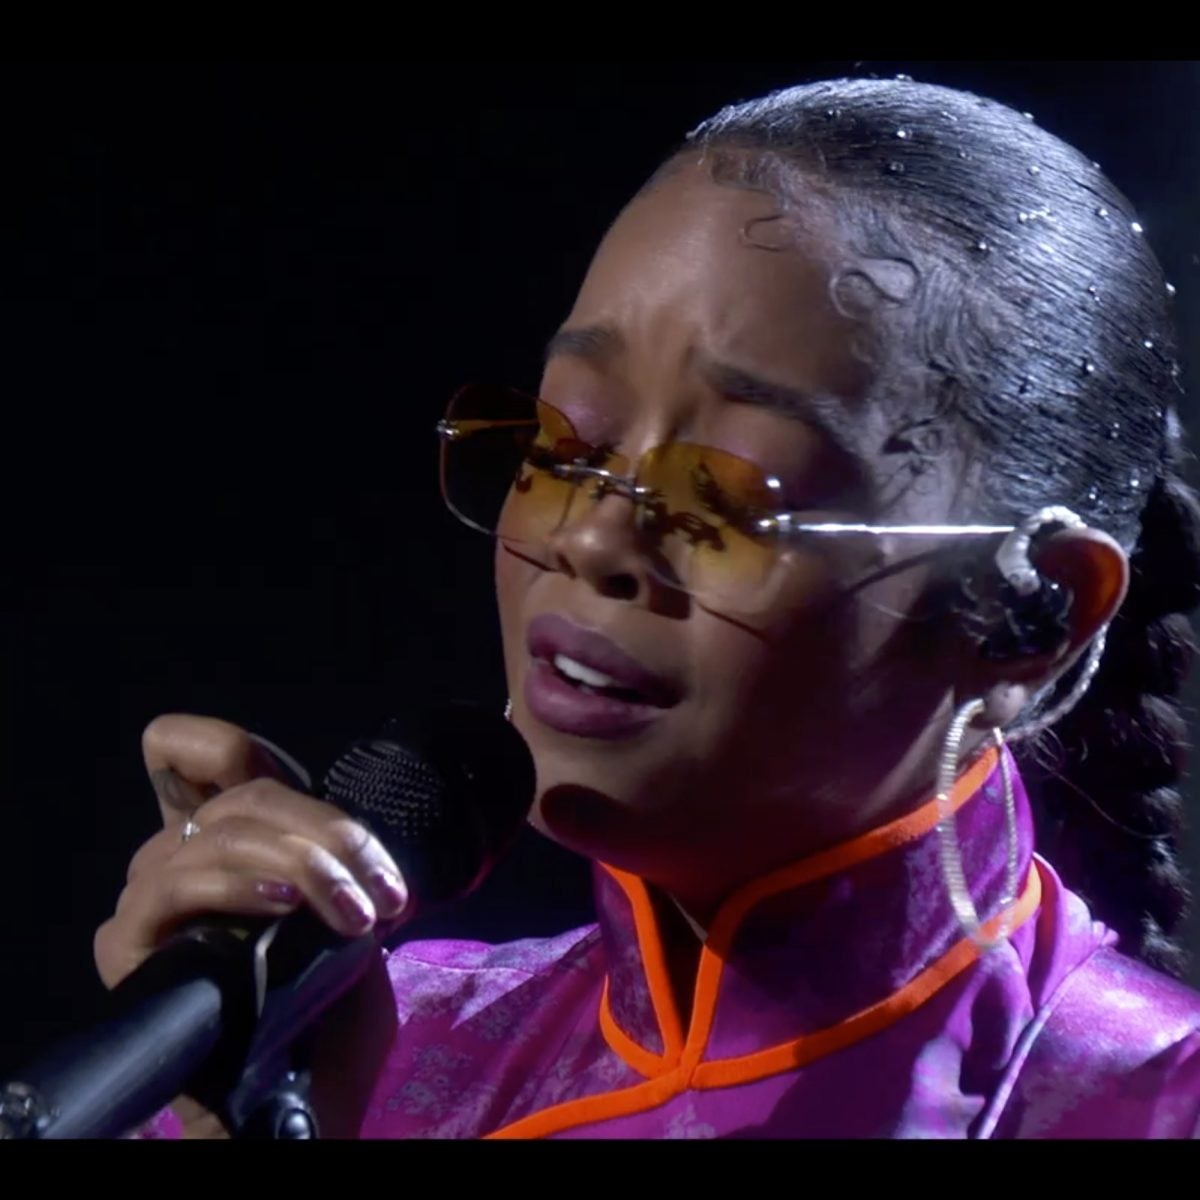 H.E.R. Delivers Heartfelt Emmy Performance Honoring Chadwick Boseman, Naya Rivera, John Witherspoon & More